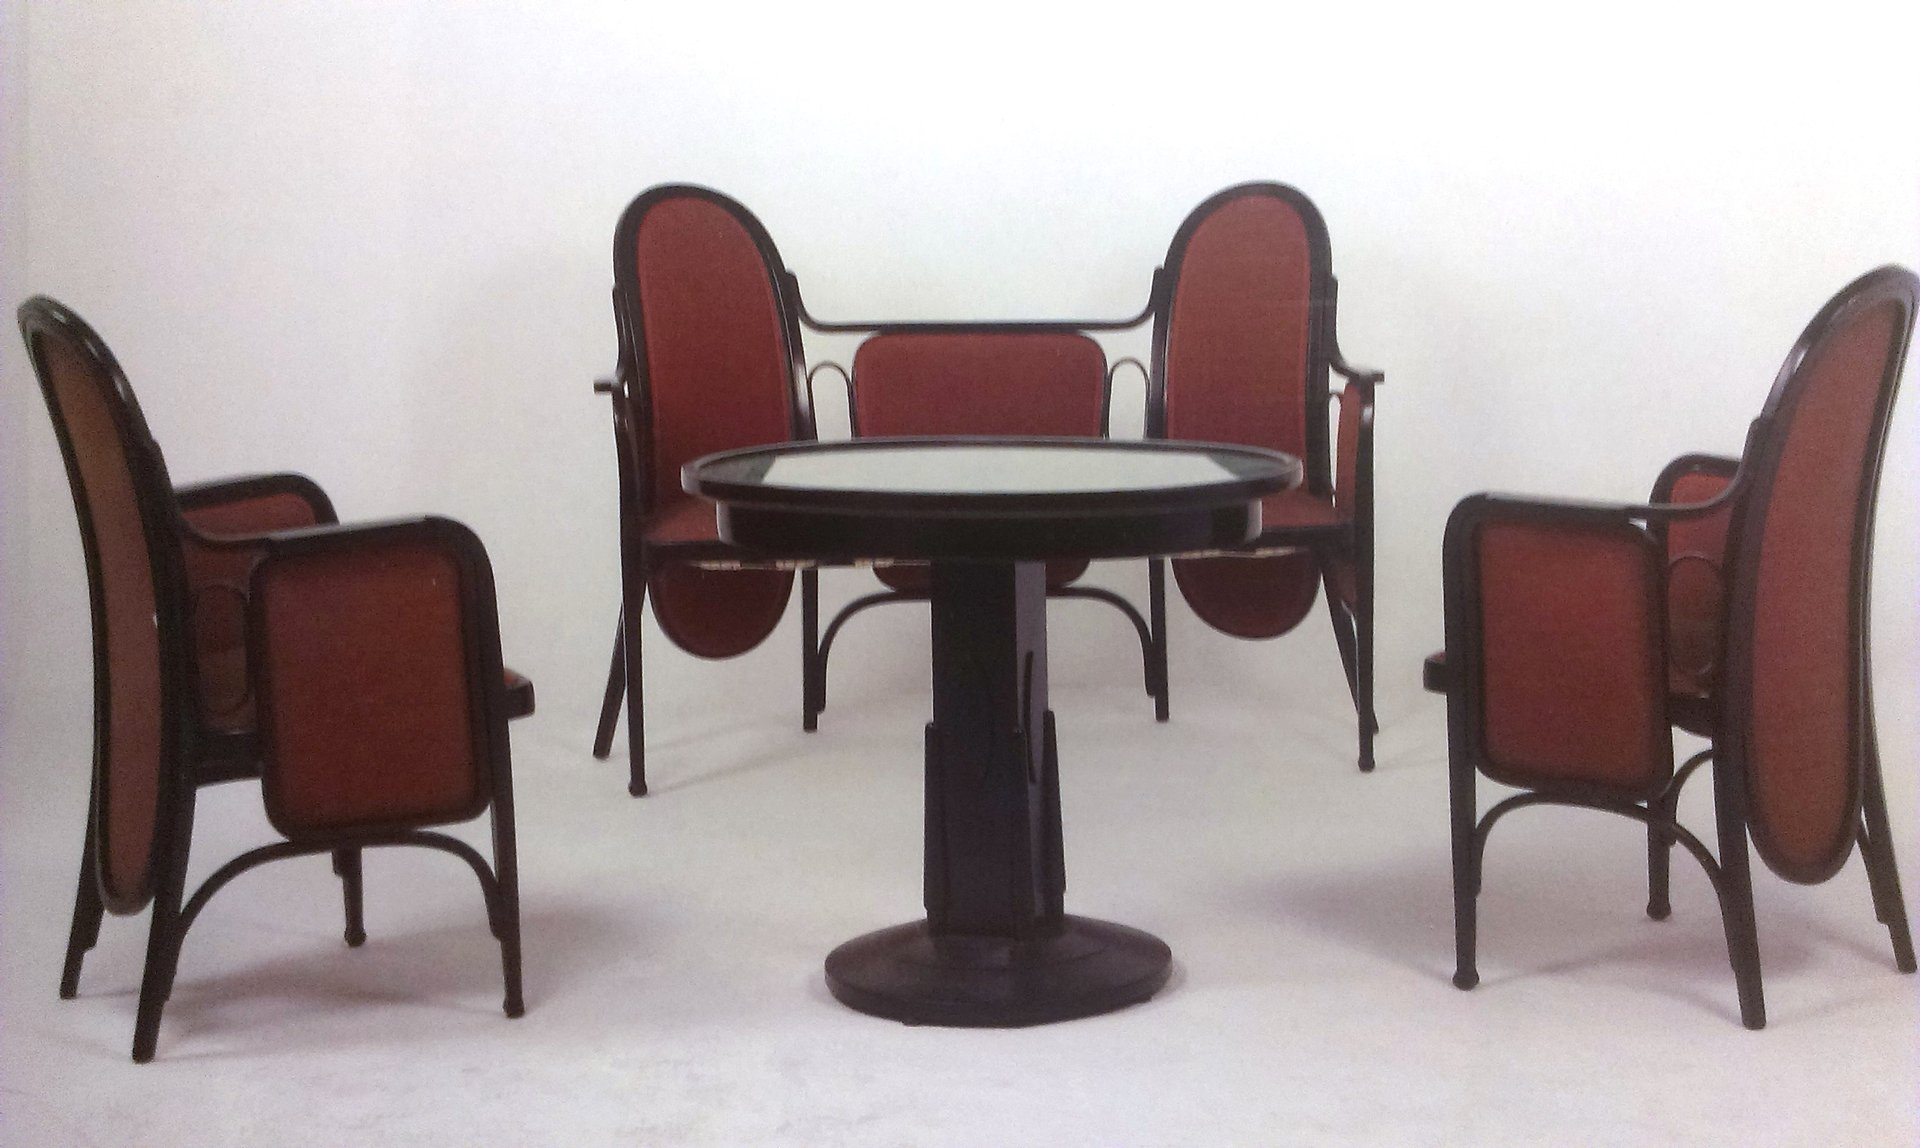 Antique Living Room Set From Thonet / Mundus